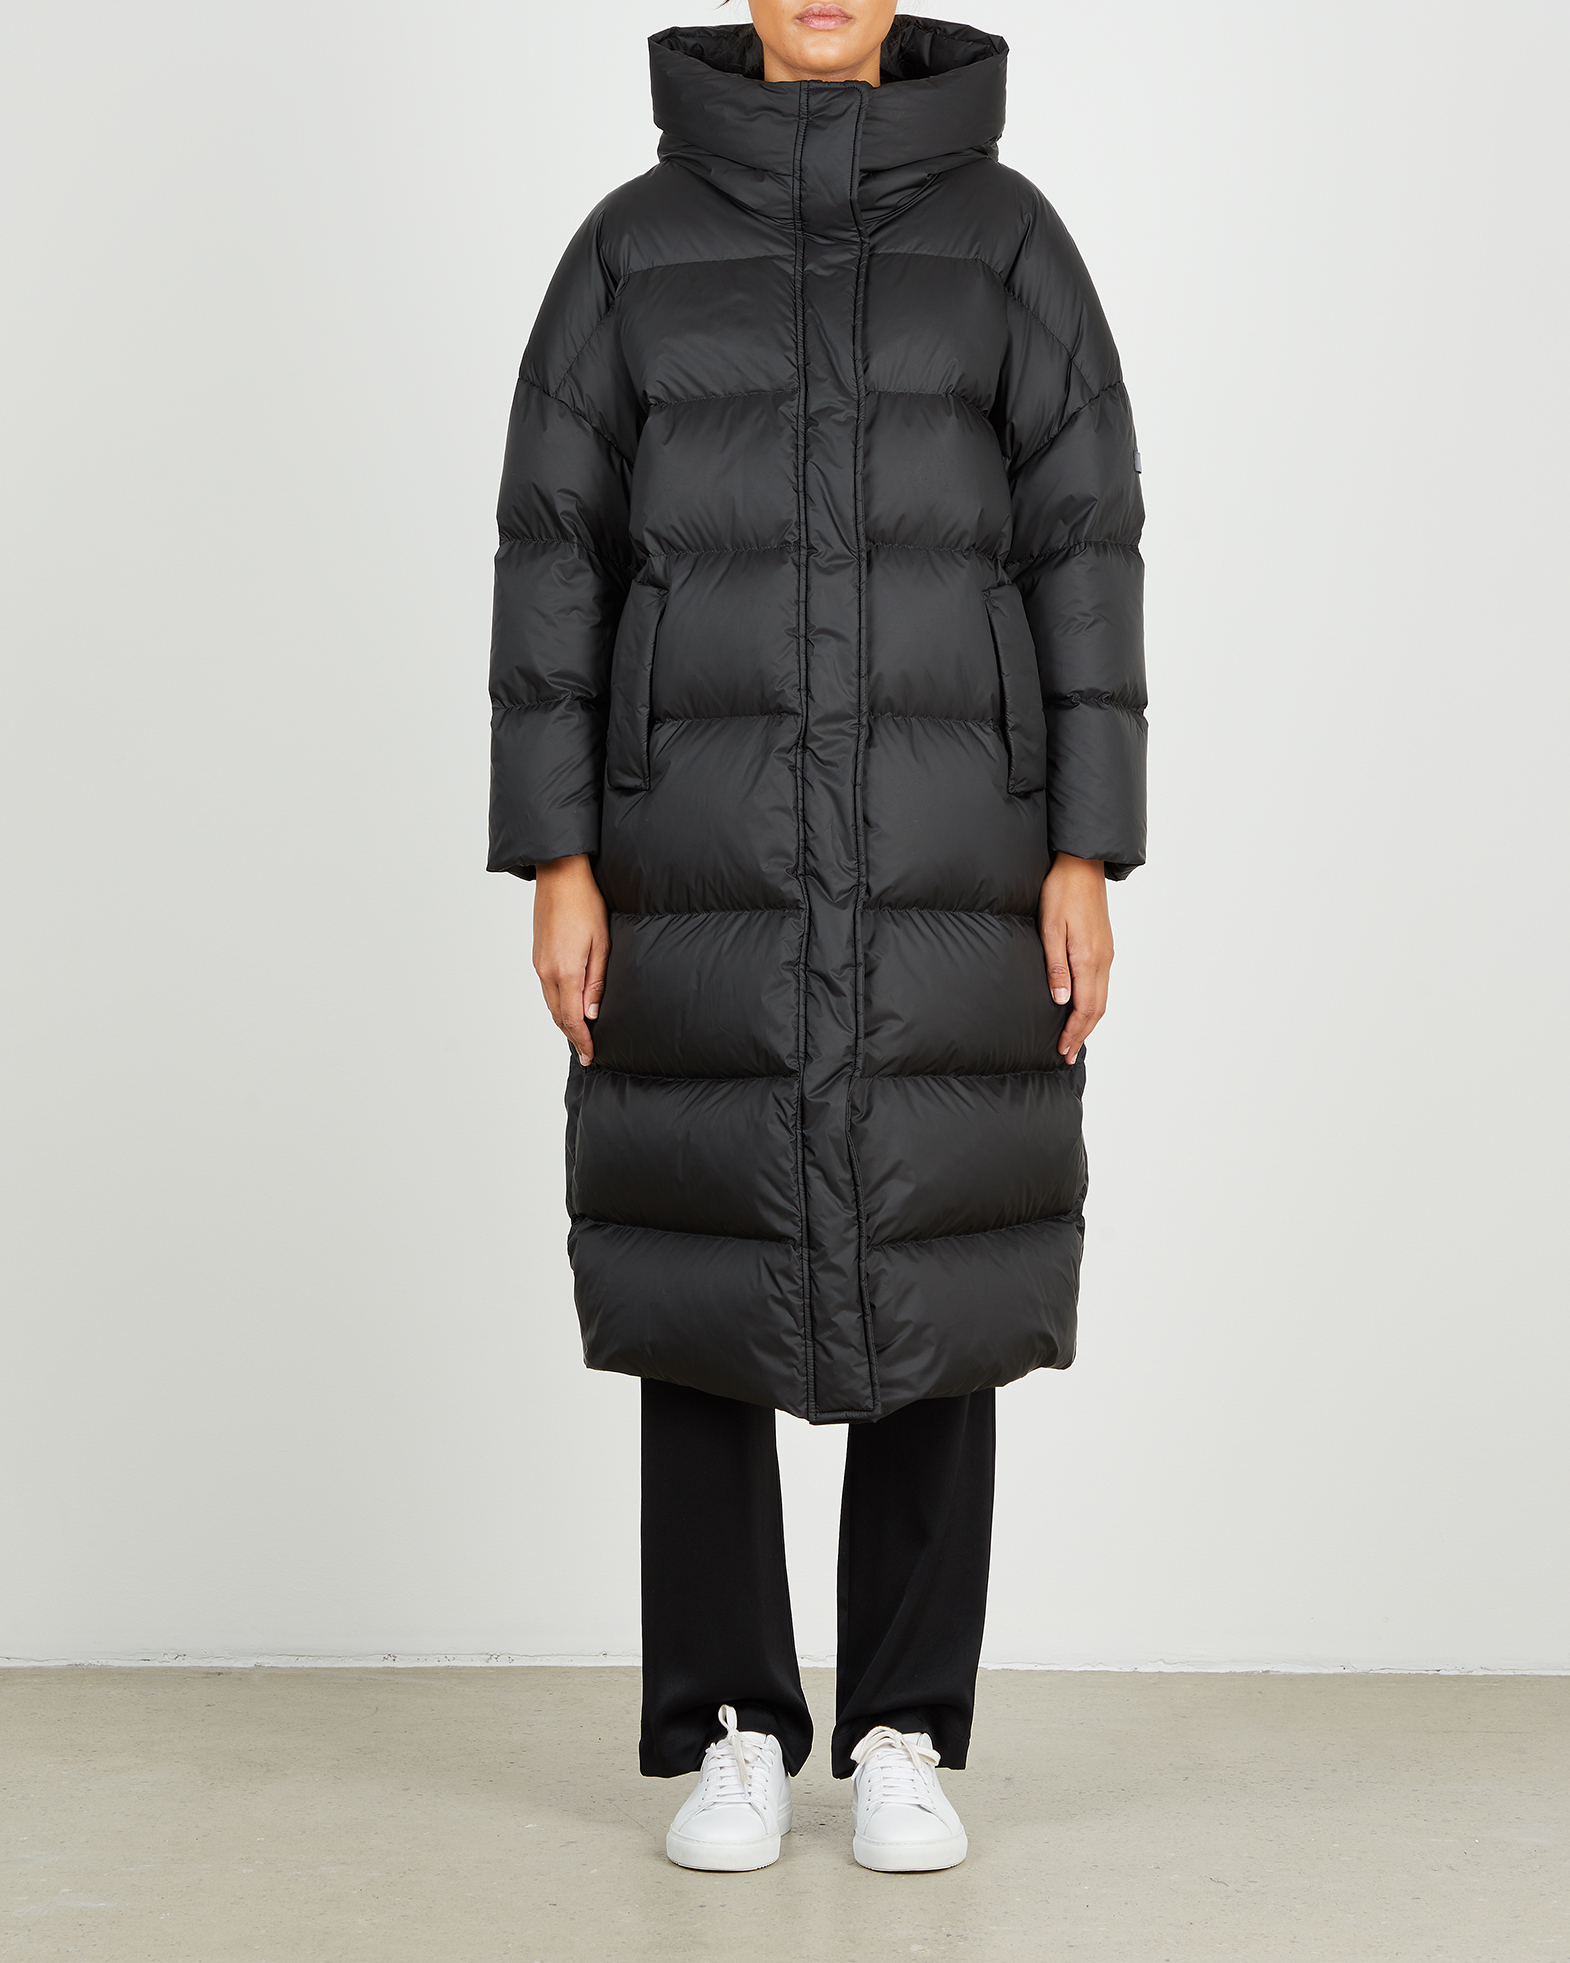 Lempelius Jacka Down Coat svart XS-S